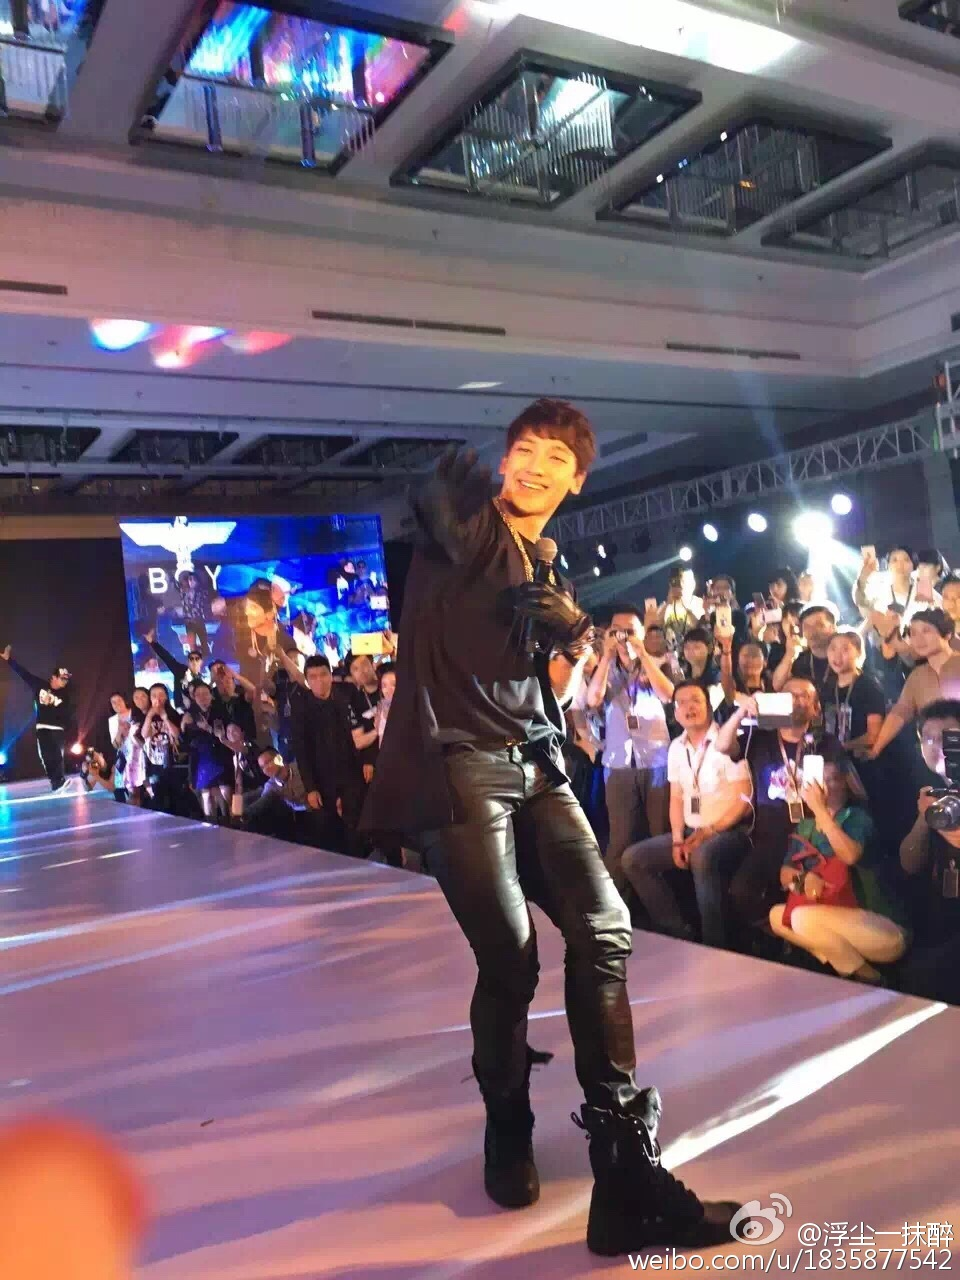 Rain  BOYLONDON 2016 ファッションショー in 北京_c0047605_7543229.jpg